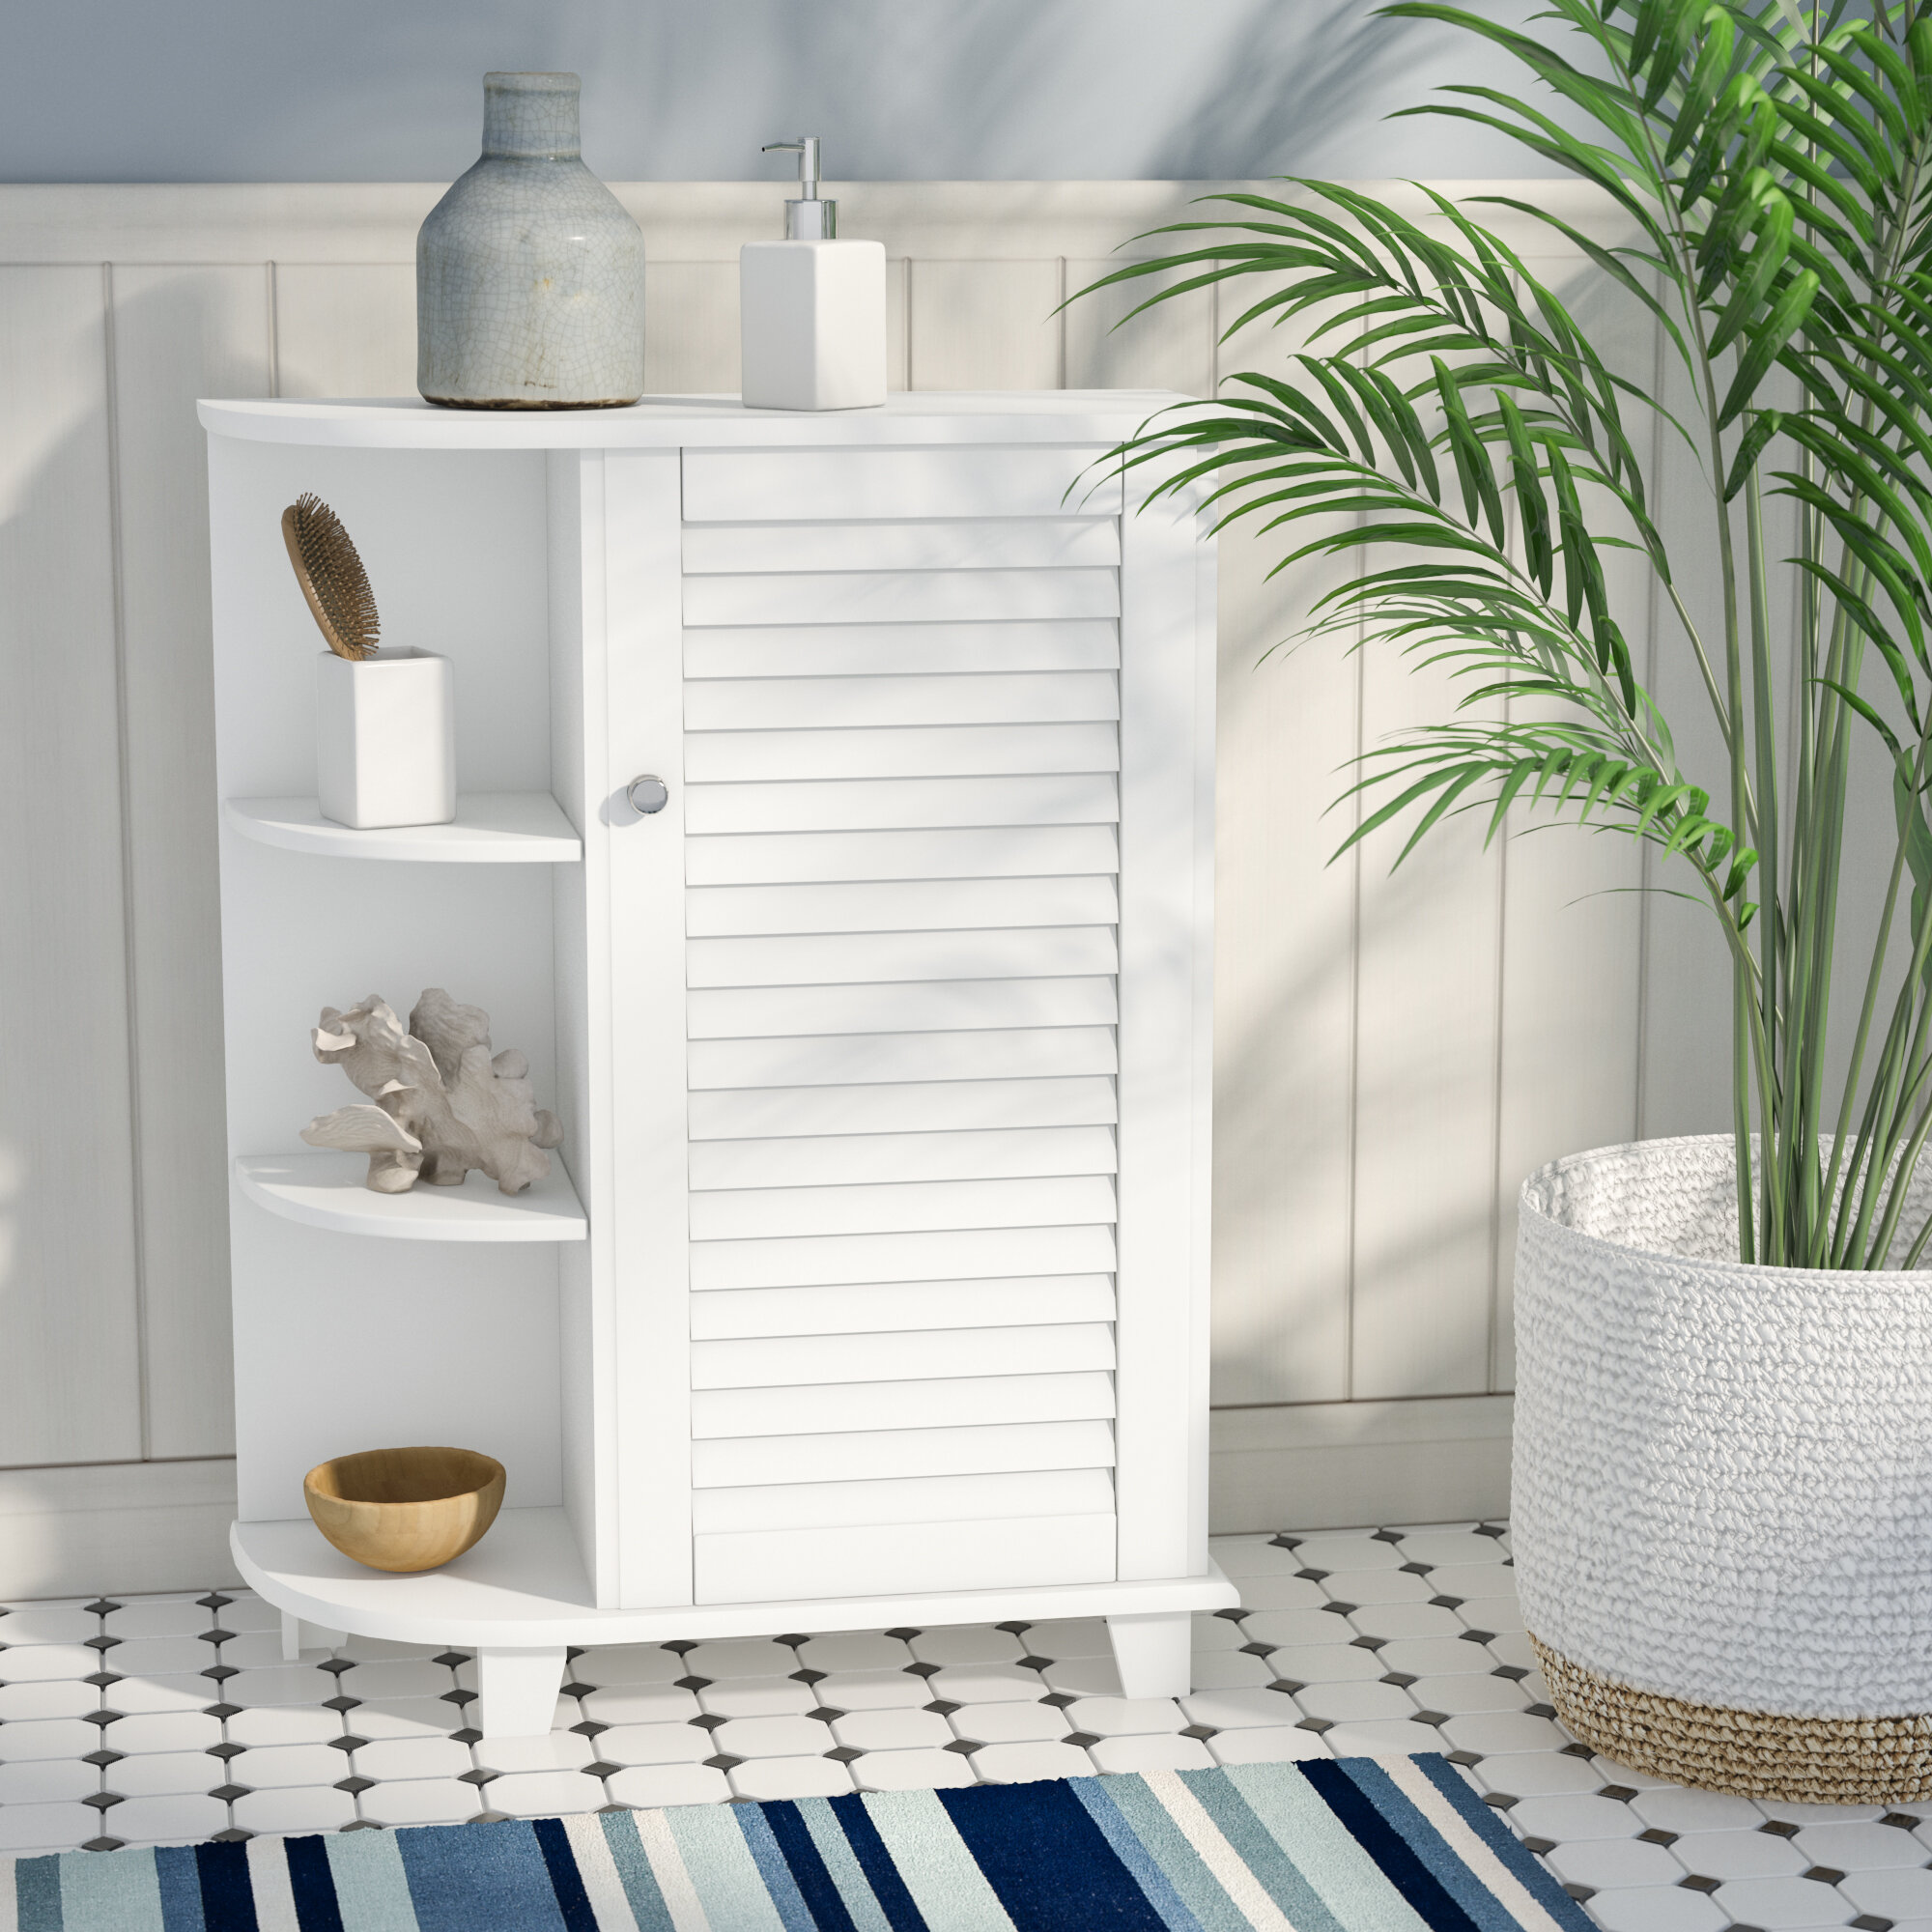 Bathroom Cabinets Free Shipping Over 35 Wayfair